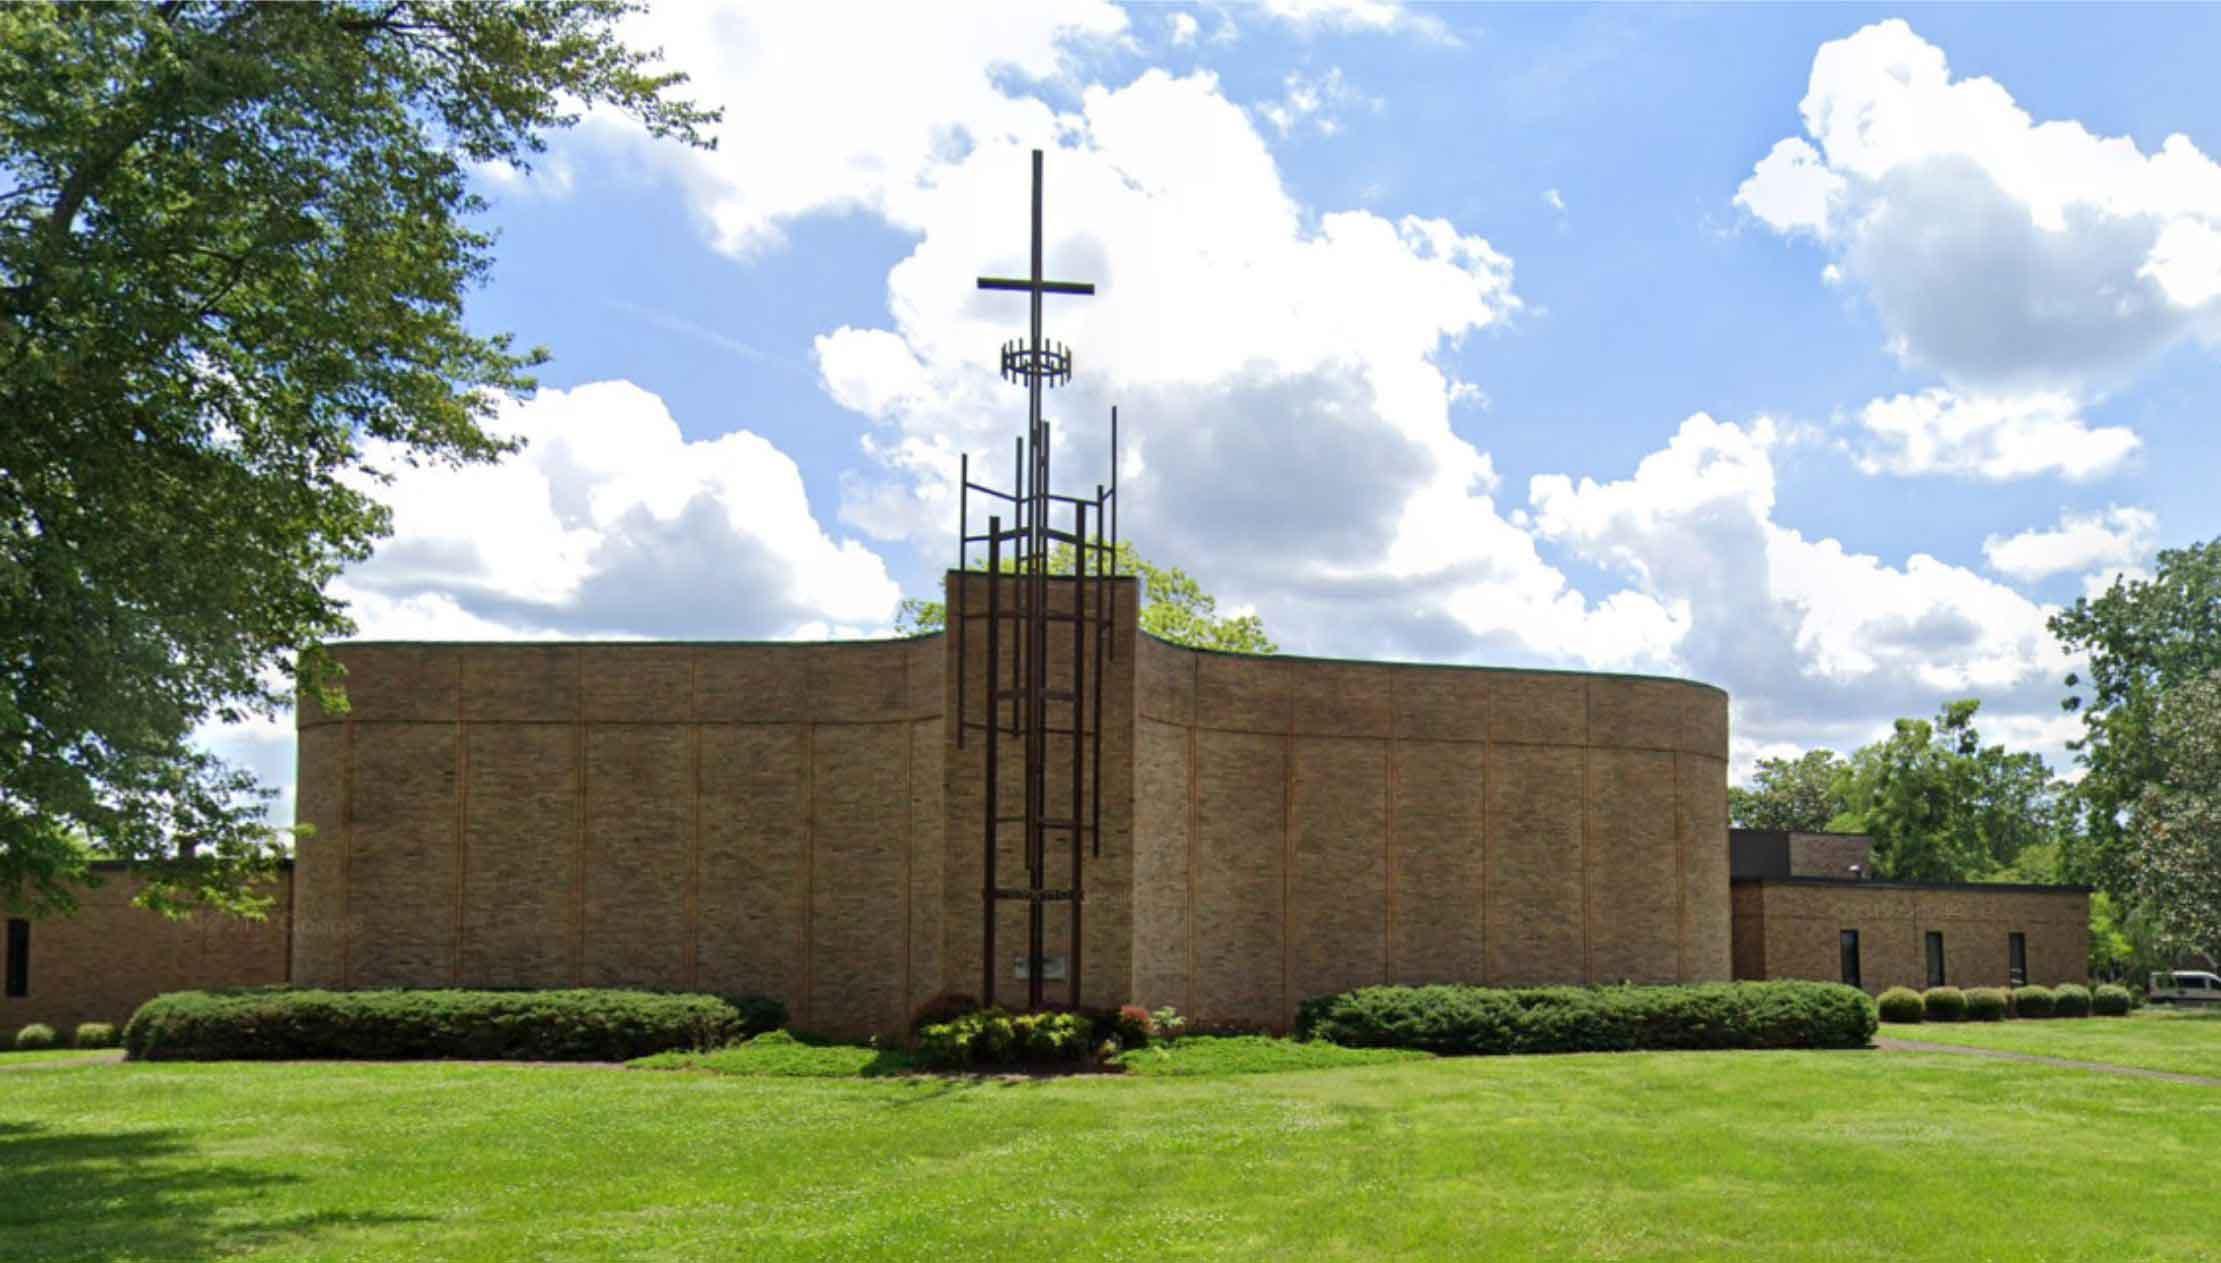 Christ Lutheran Church in Hickory, North Carolina